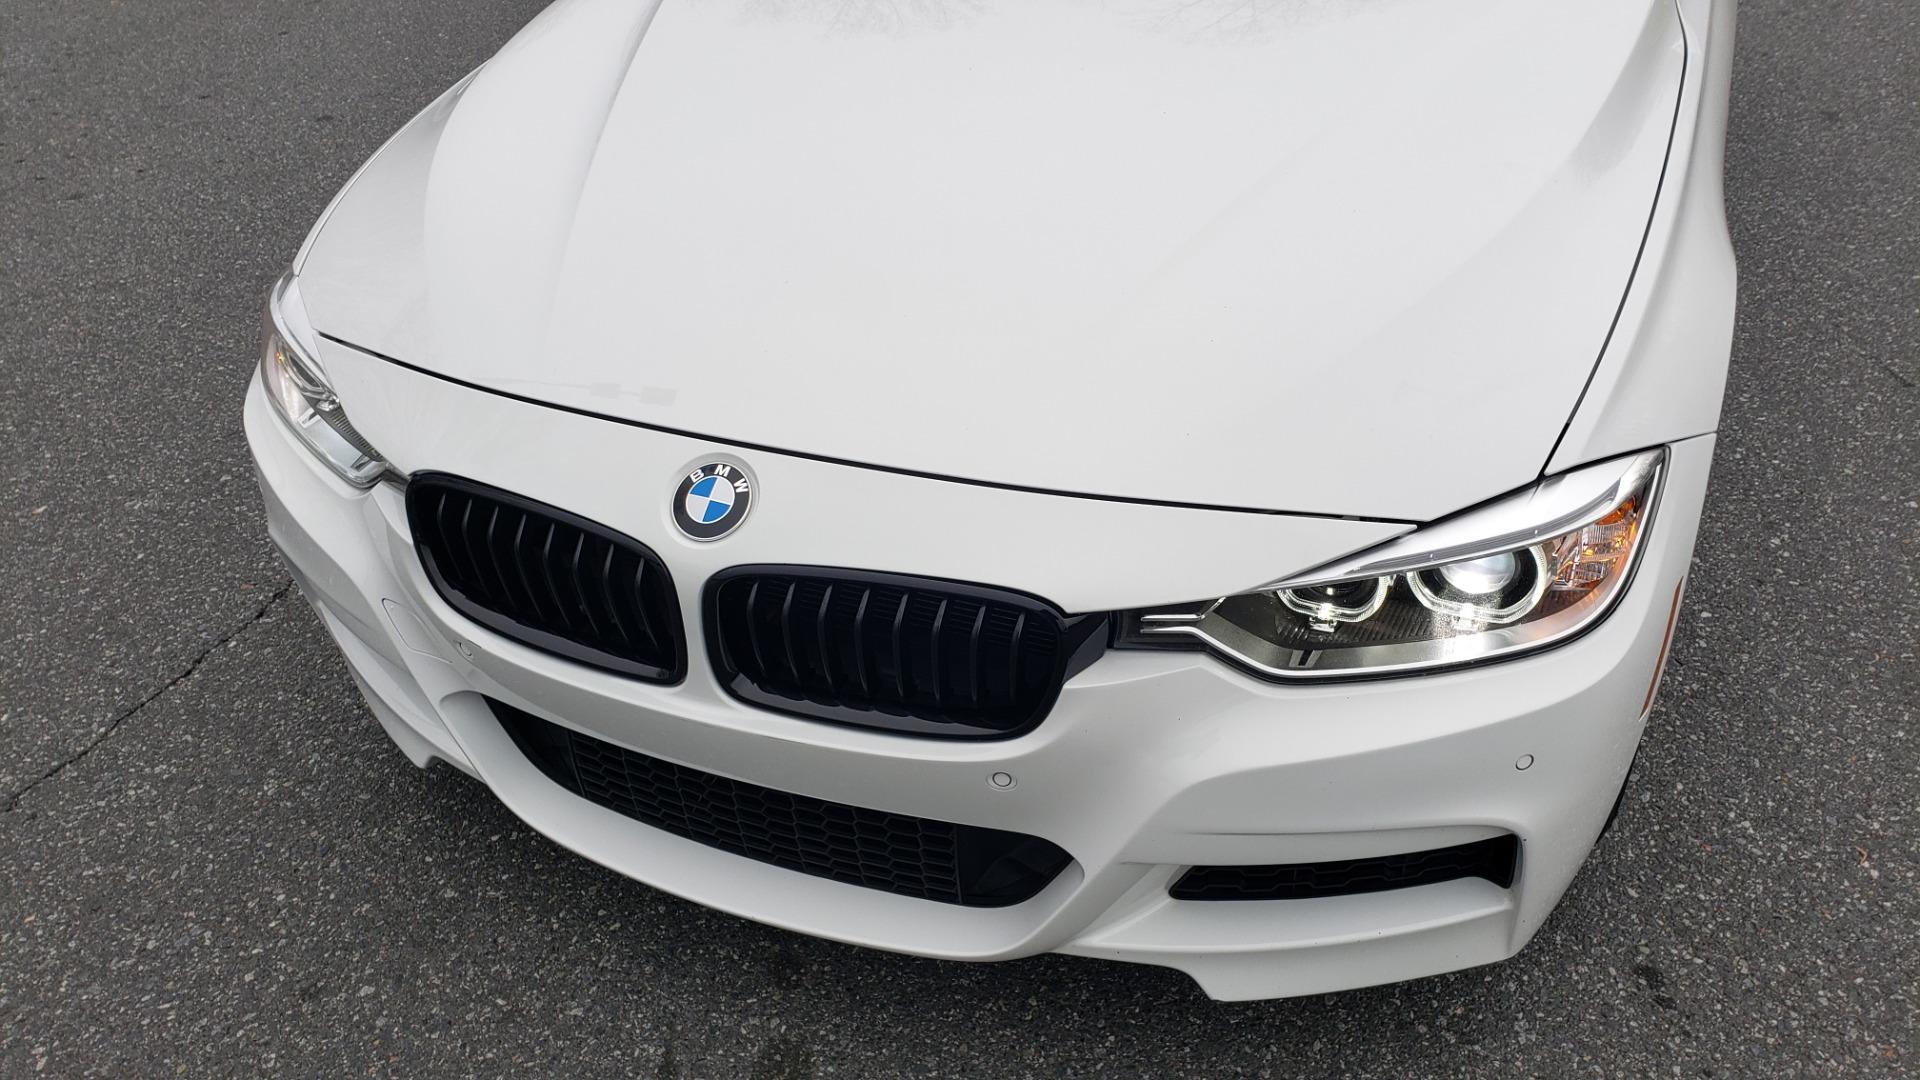 Used 2015 BMW 3 Series 335I M-SPORT / PREM PKG / HK SND / SUNROOF / REARVIEW for sale Sold at Formula Imports in Charlotte NC 28227 24